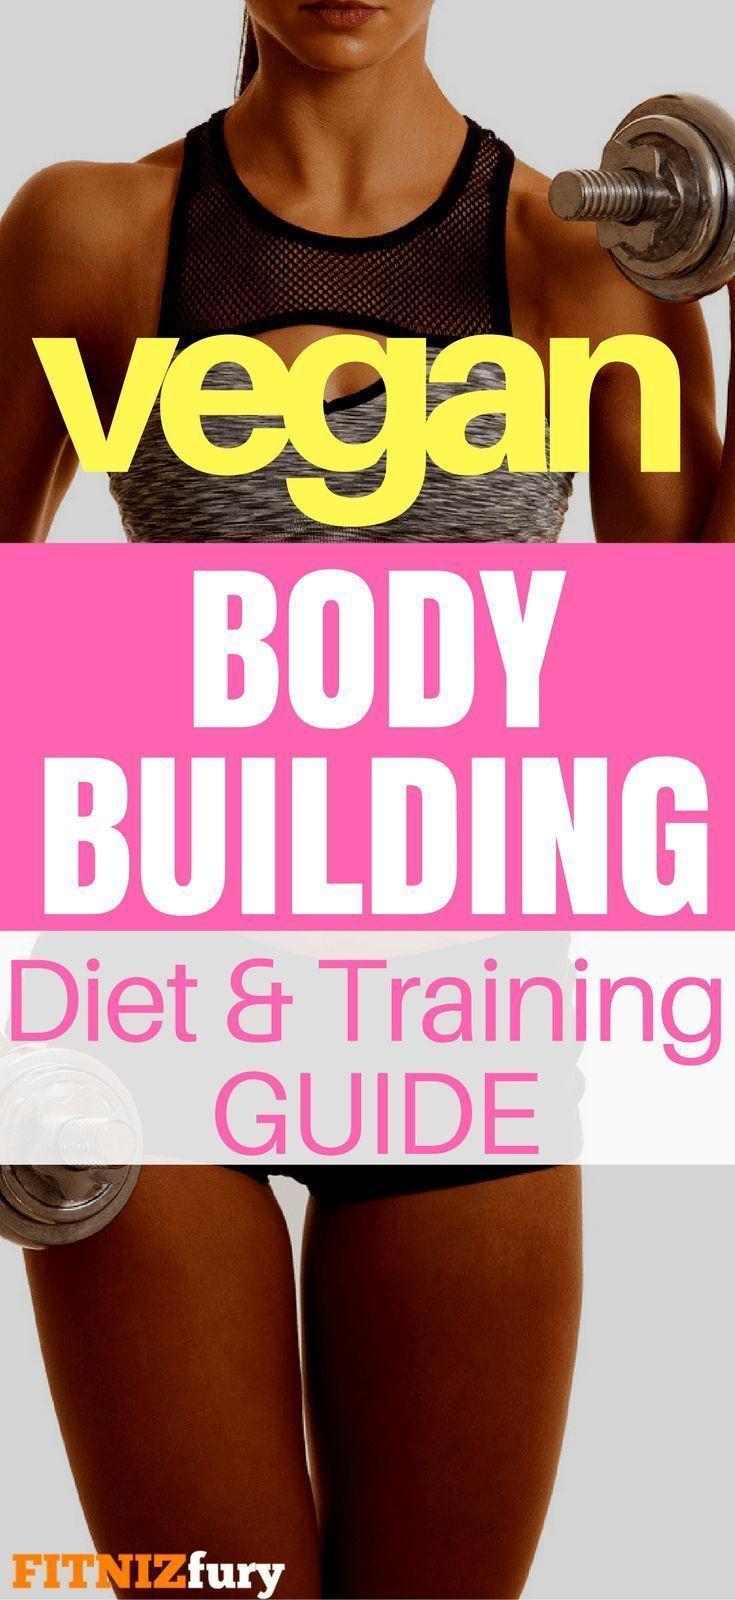 Vegan Bodybuilding Diet Women  The Best Bodybuilding tips for Vegan and Plant based Diets